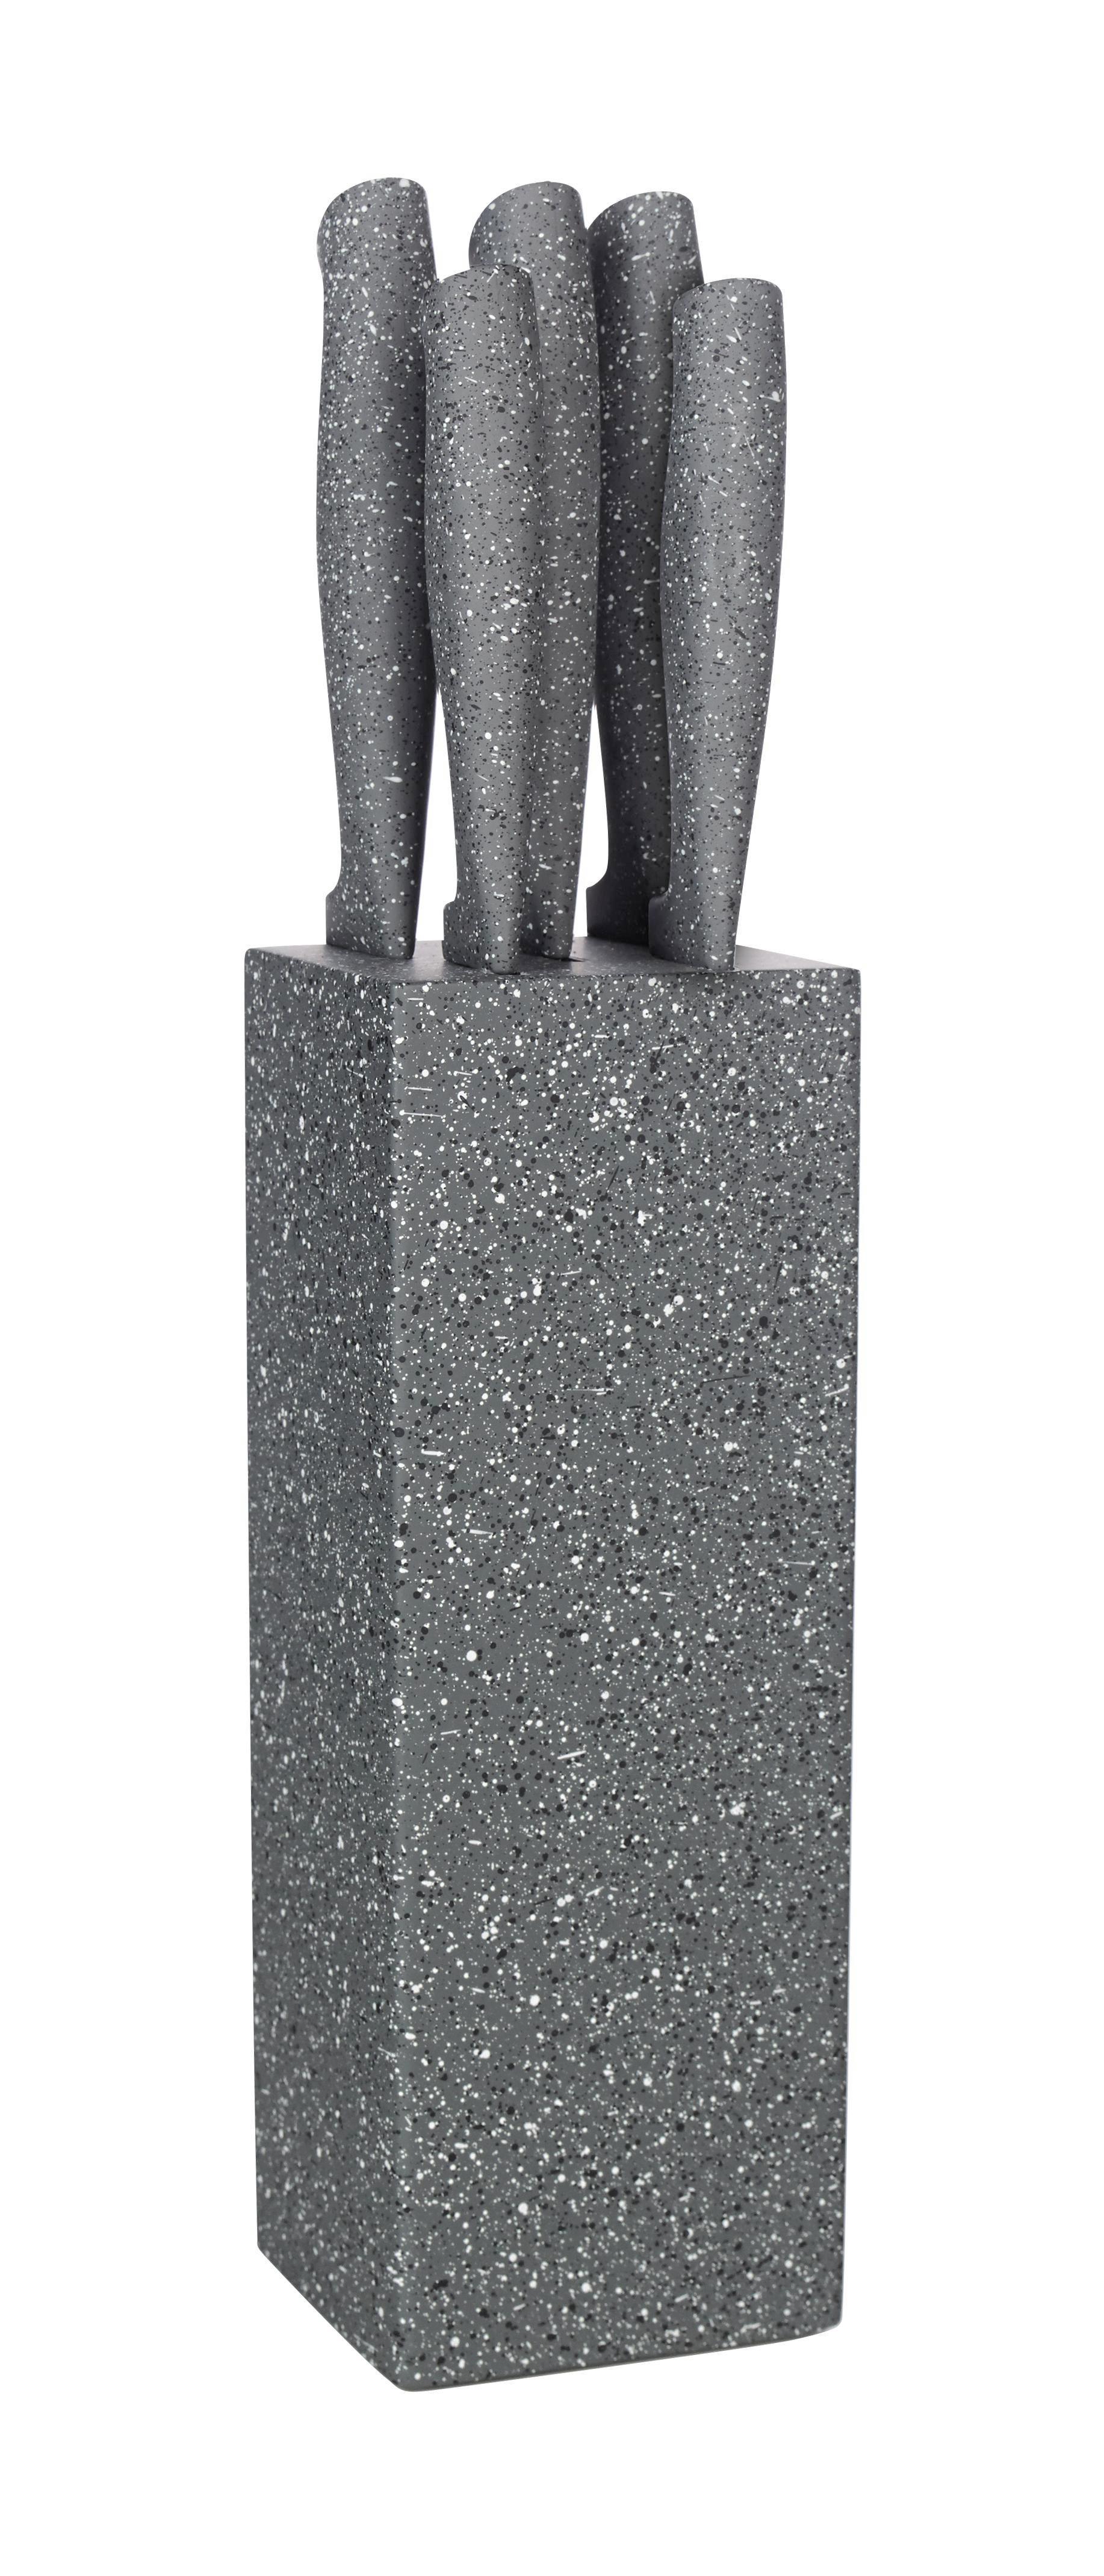 Set Nožev Garry - Moderno, kovina (8/8/35cm) - MÖMAX modern living